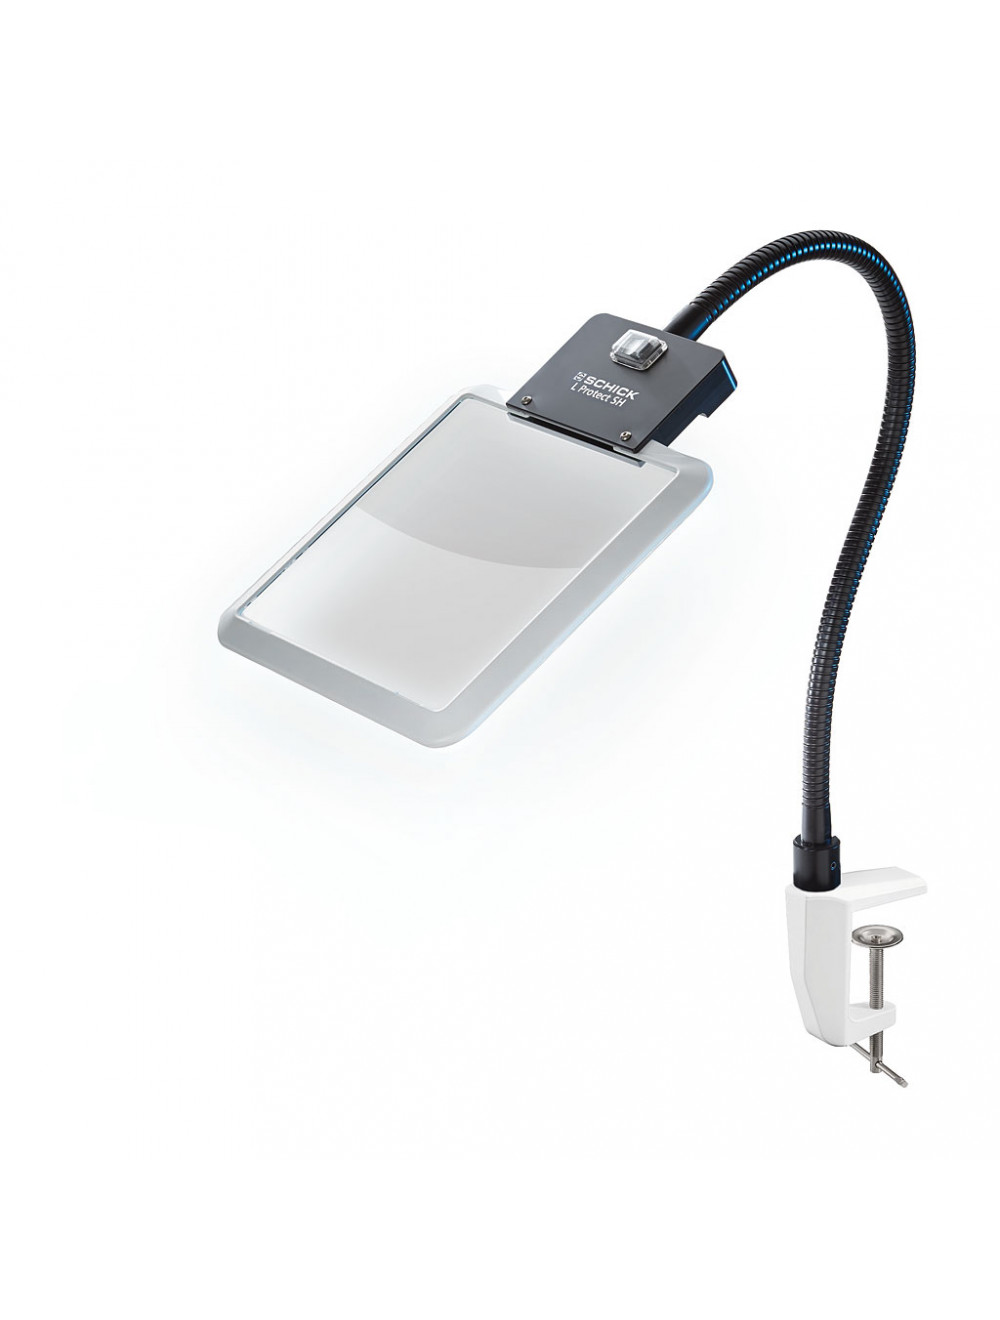 Schick L Protect SH-D LED-beleuchtete Schutzscheibe mit fexiblem Schwanenhals mit Tischklemme 4479